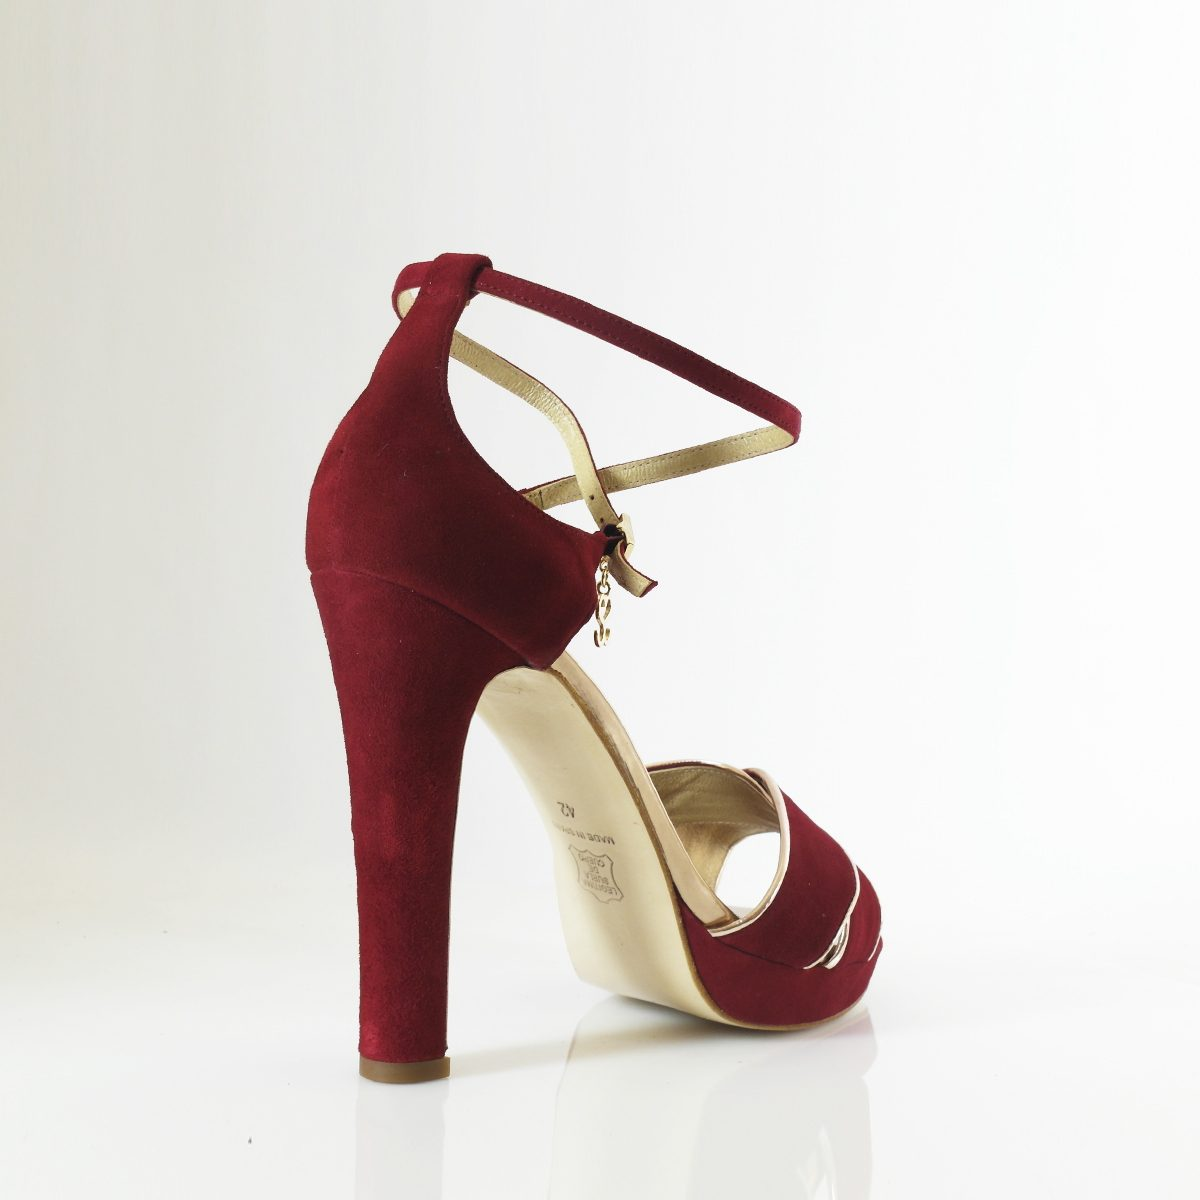 SANDALIA MOD.1996 (12,5cm) - Zapatos Personalizados Fiesta